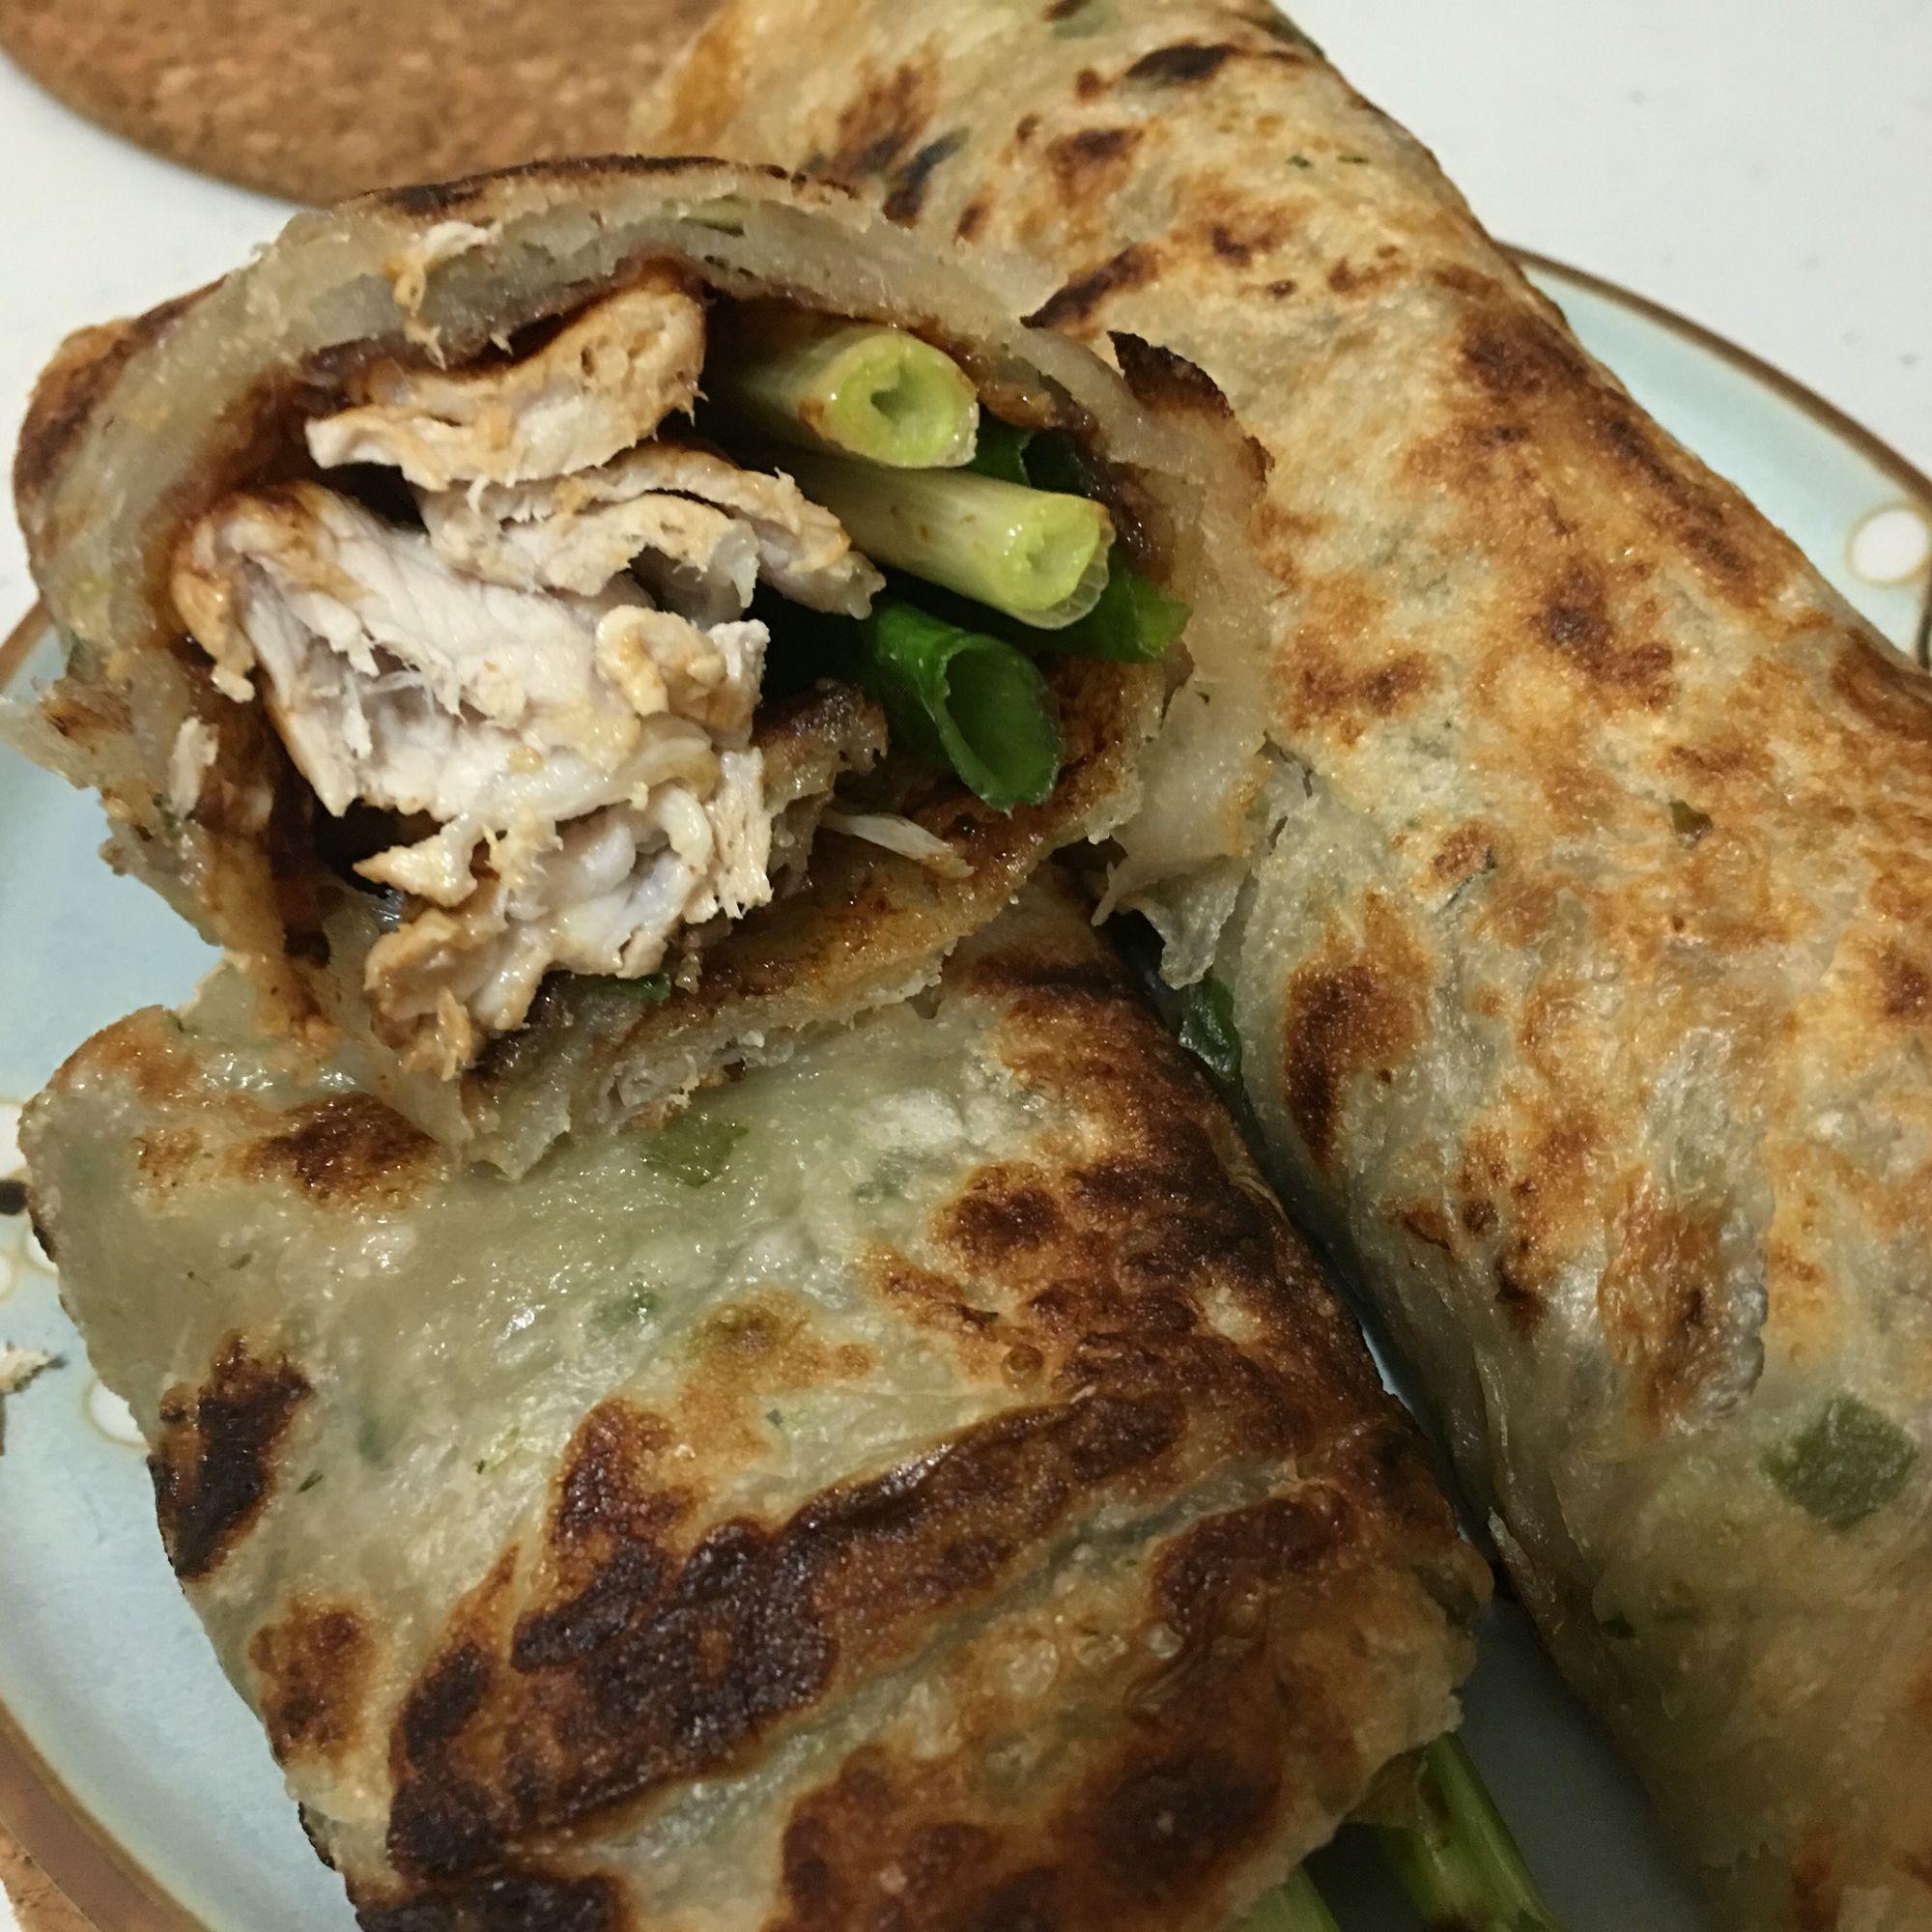 Beijing flavor pork burrito real chinese cuisine food